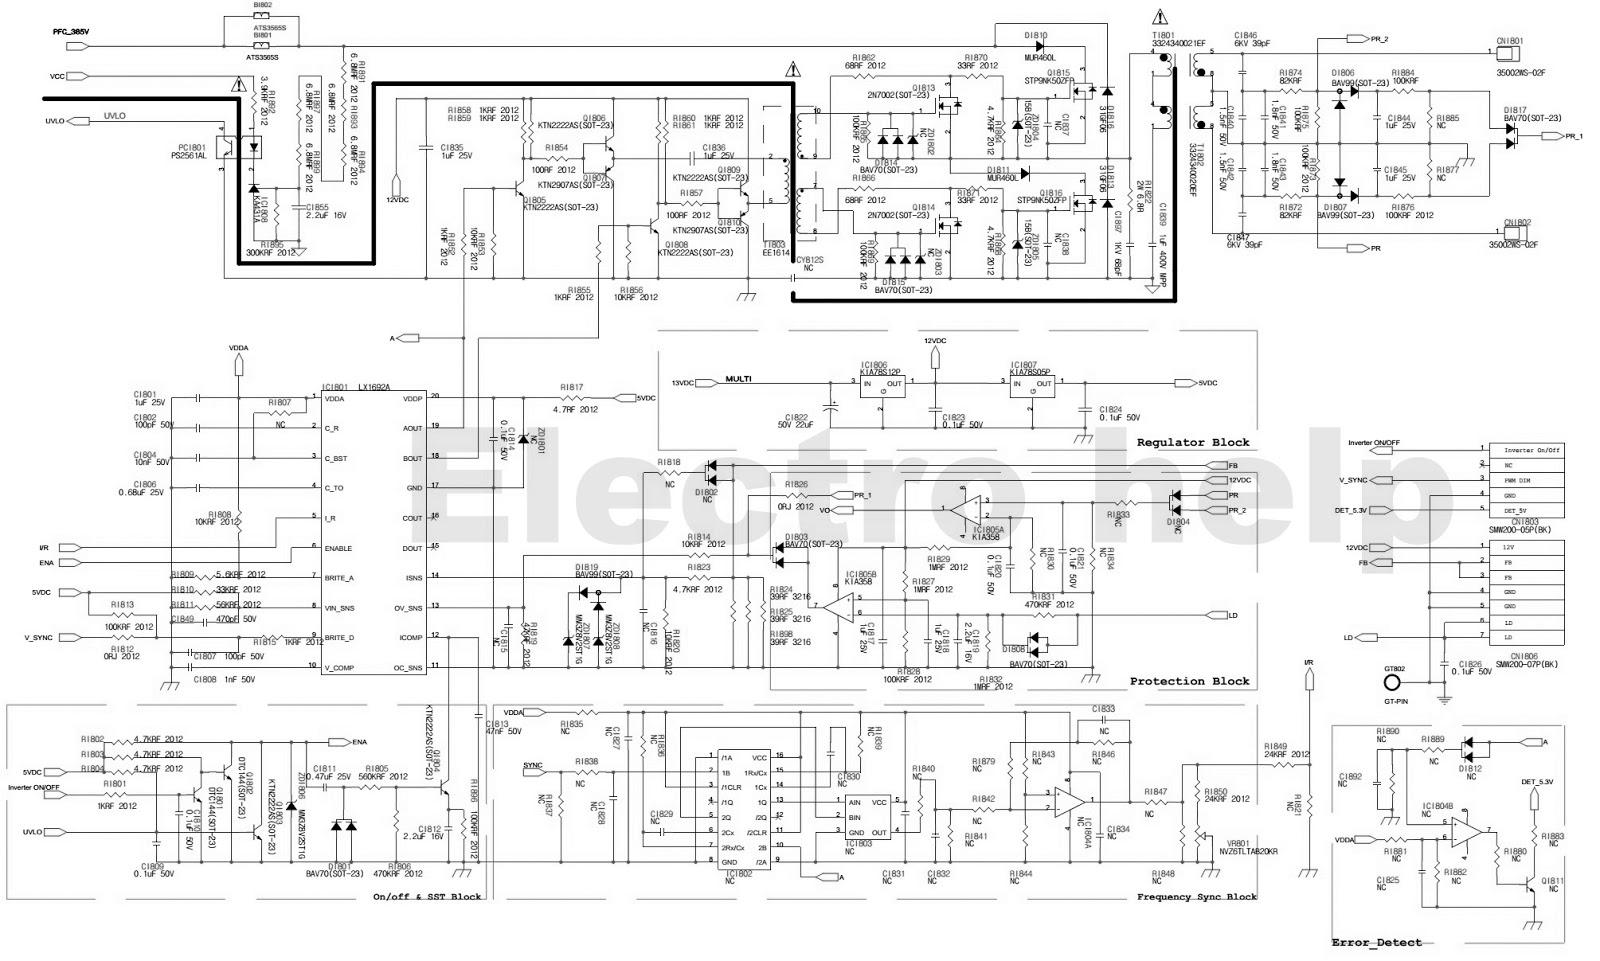 Bn44-00197 - Samsung Lcd Tv Power Supply Circuit Diagram